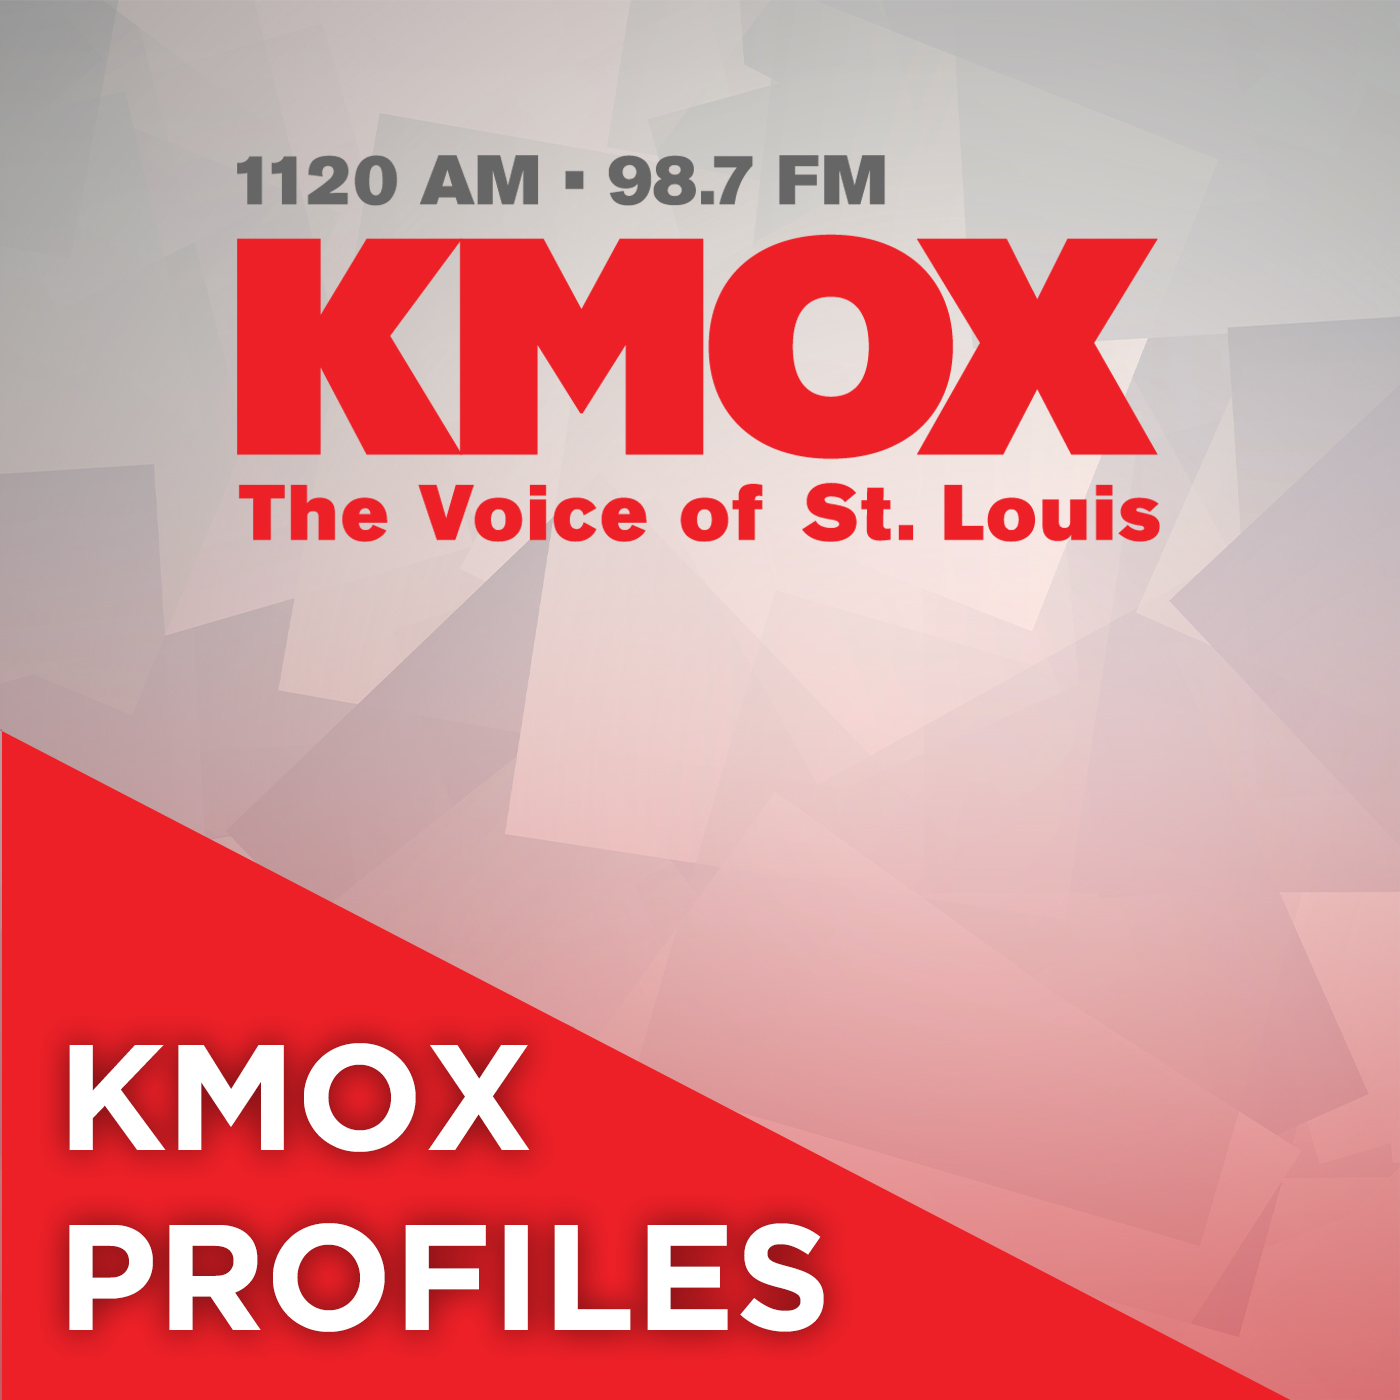 KMOX Profiles